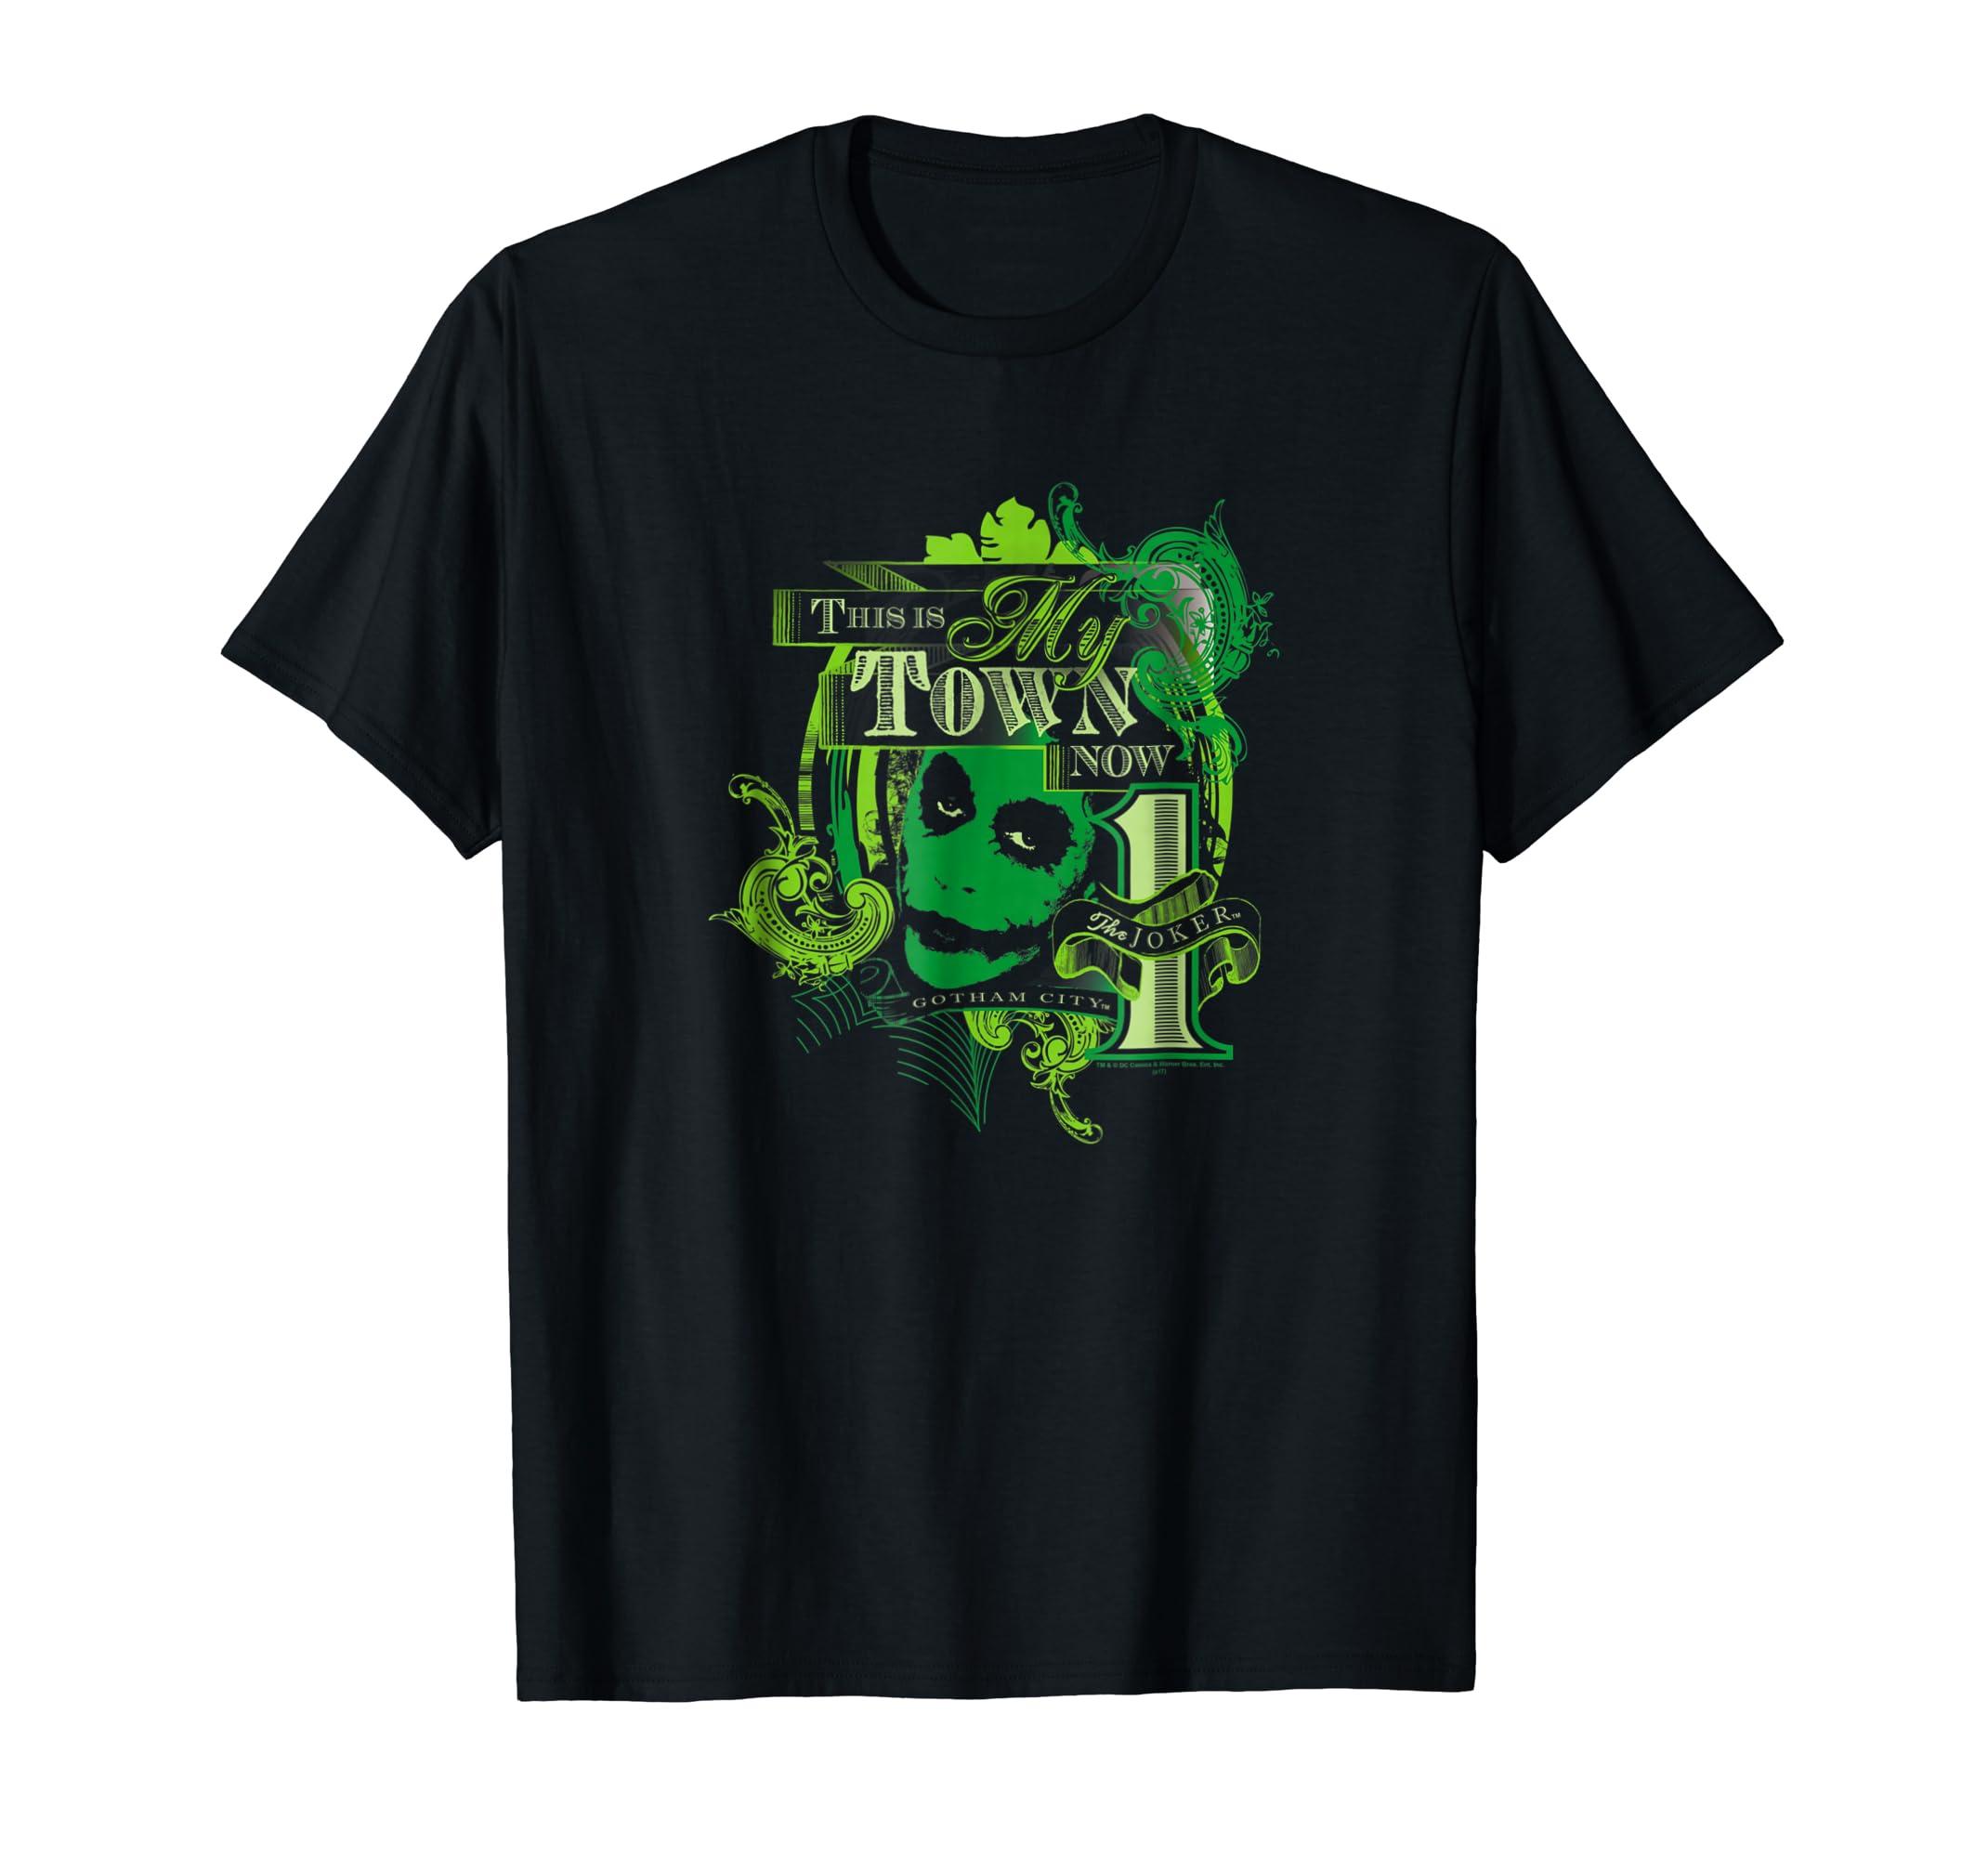 9d9858dd Amazon.com: Batman Dark Knight Joker My Town Now T Shirt: Clothing